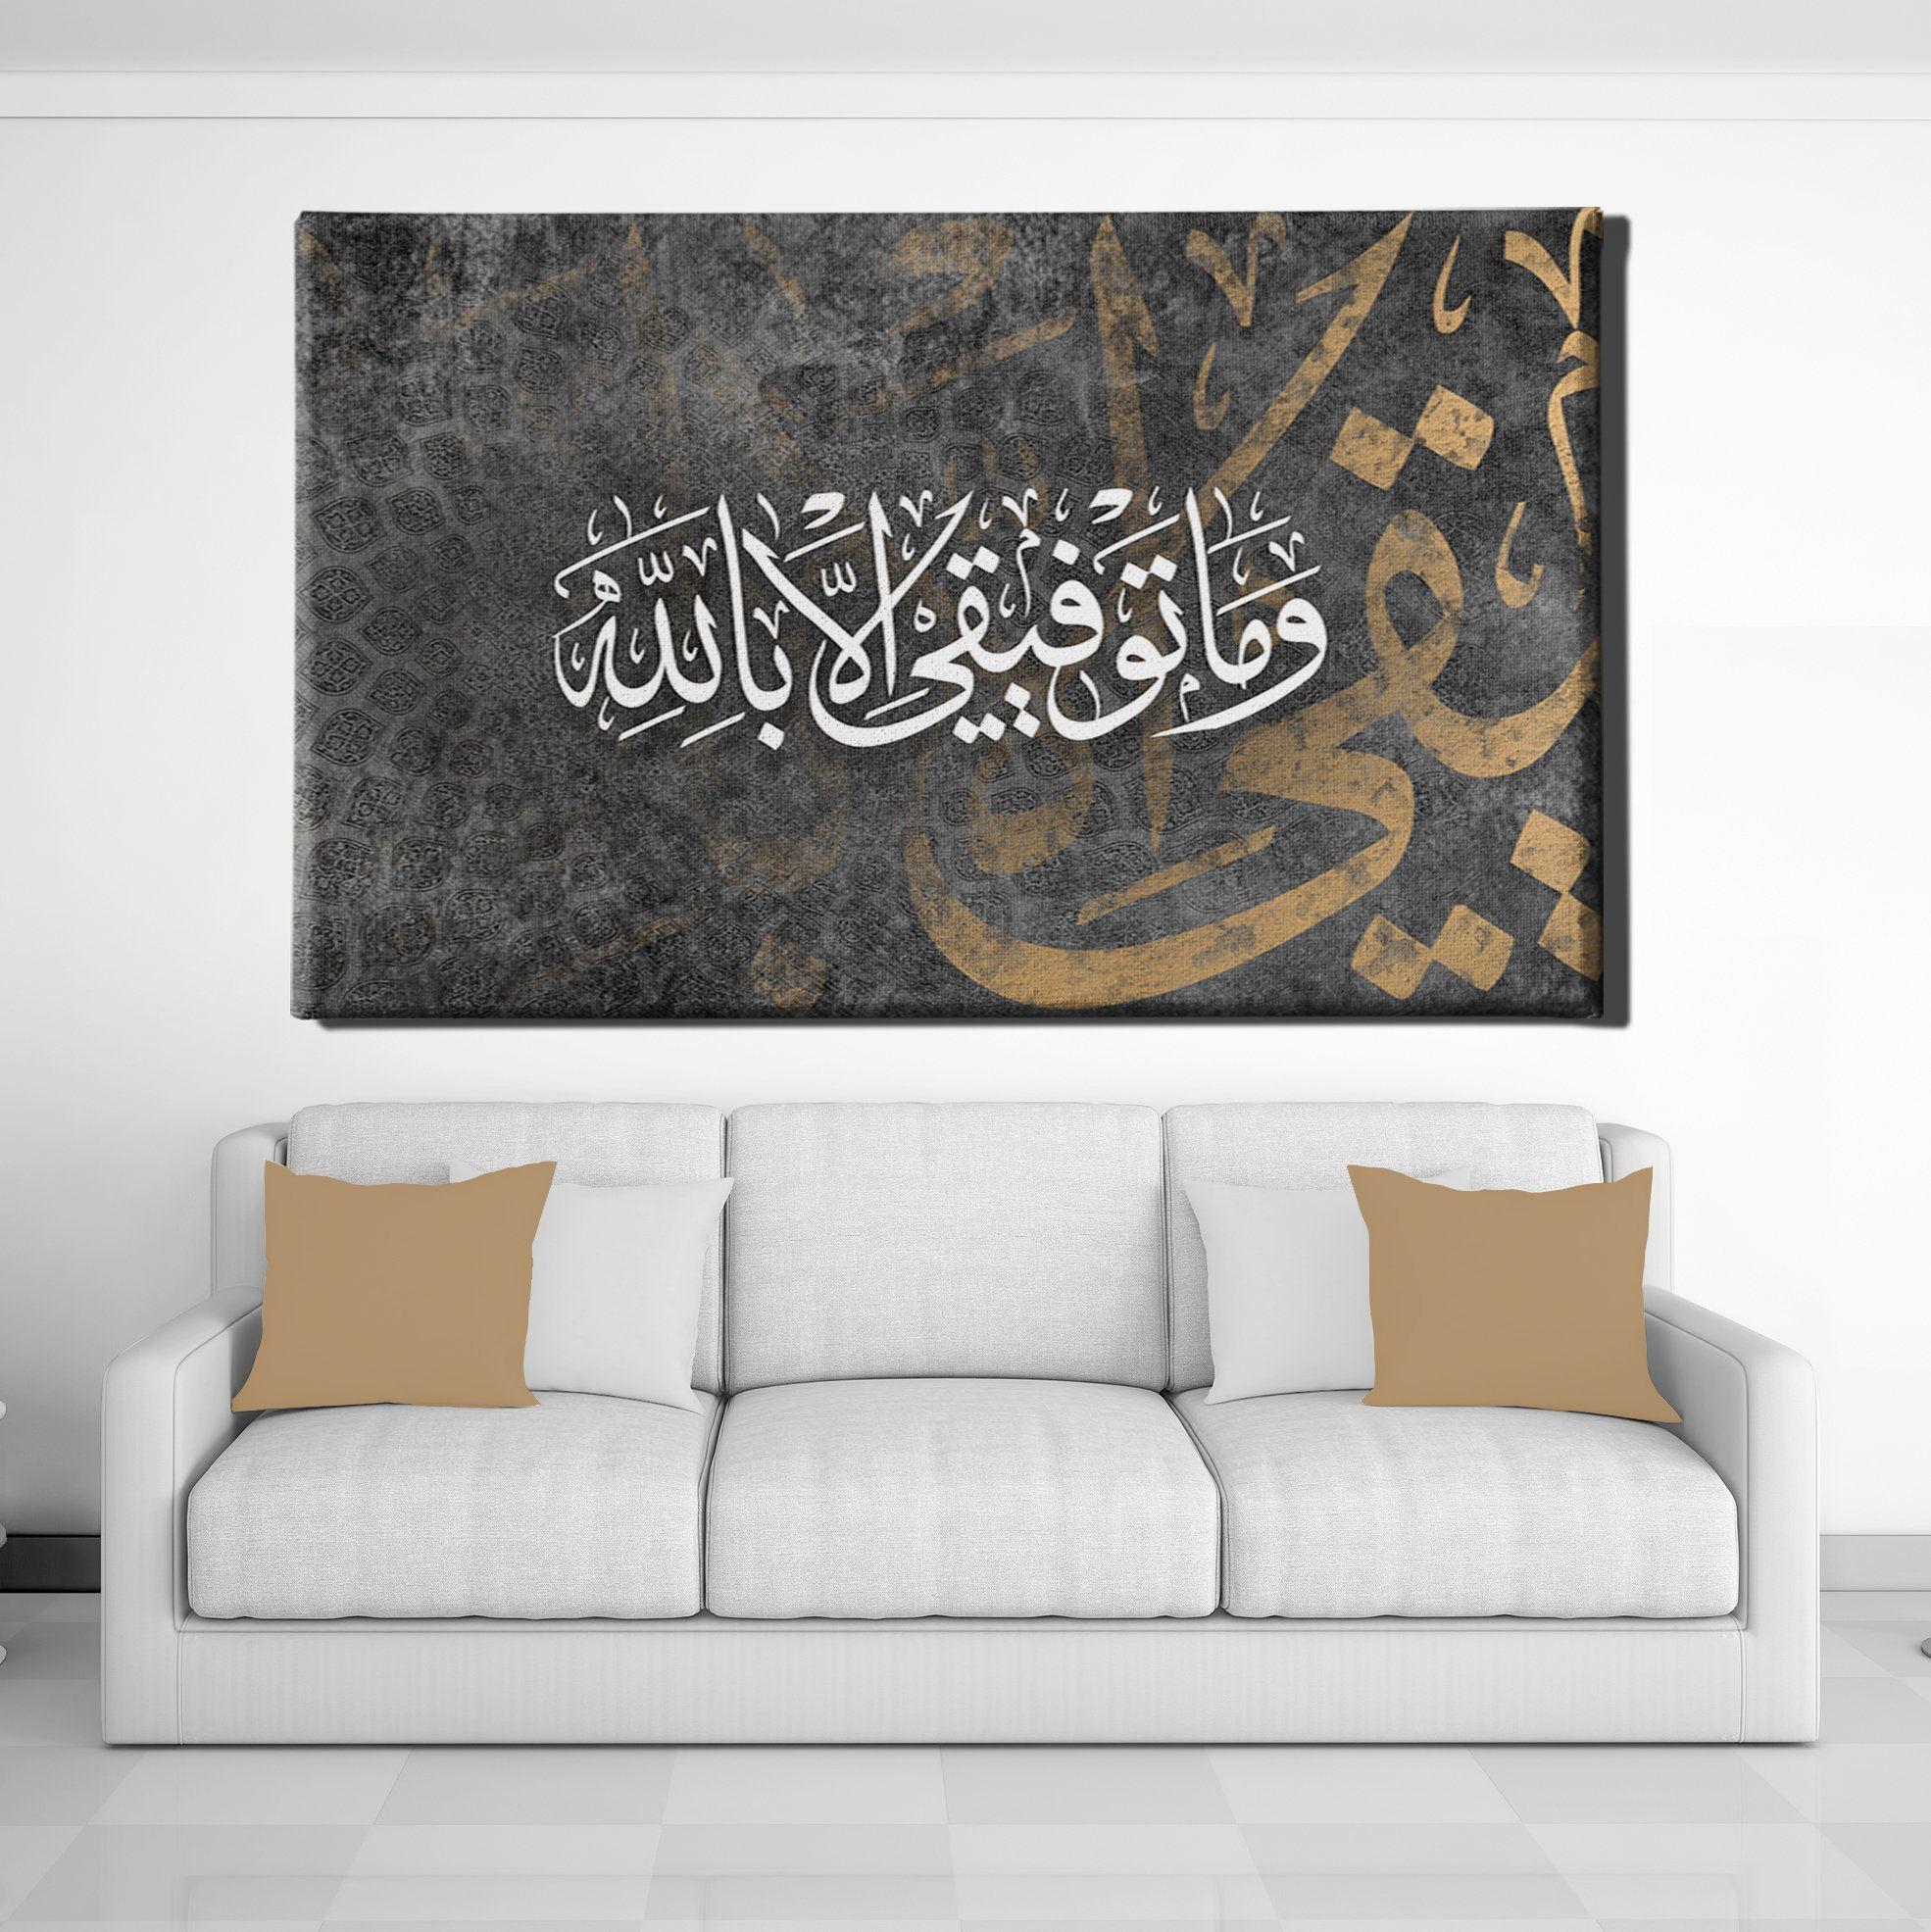 Modern Islamic Wall Art Canvas Framed Perfect For Muslim Home Decor Calligraphy Wall Art Islamic Wall Art Islamic Art Canvas